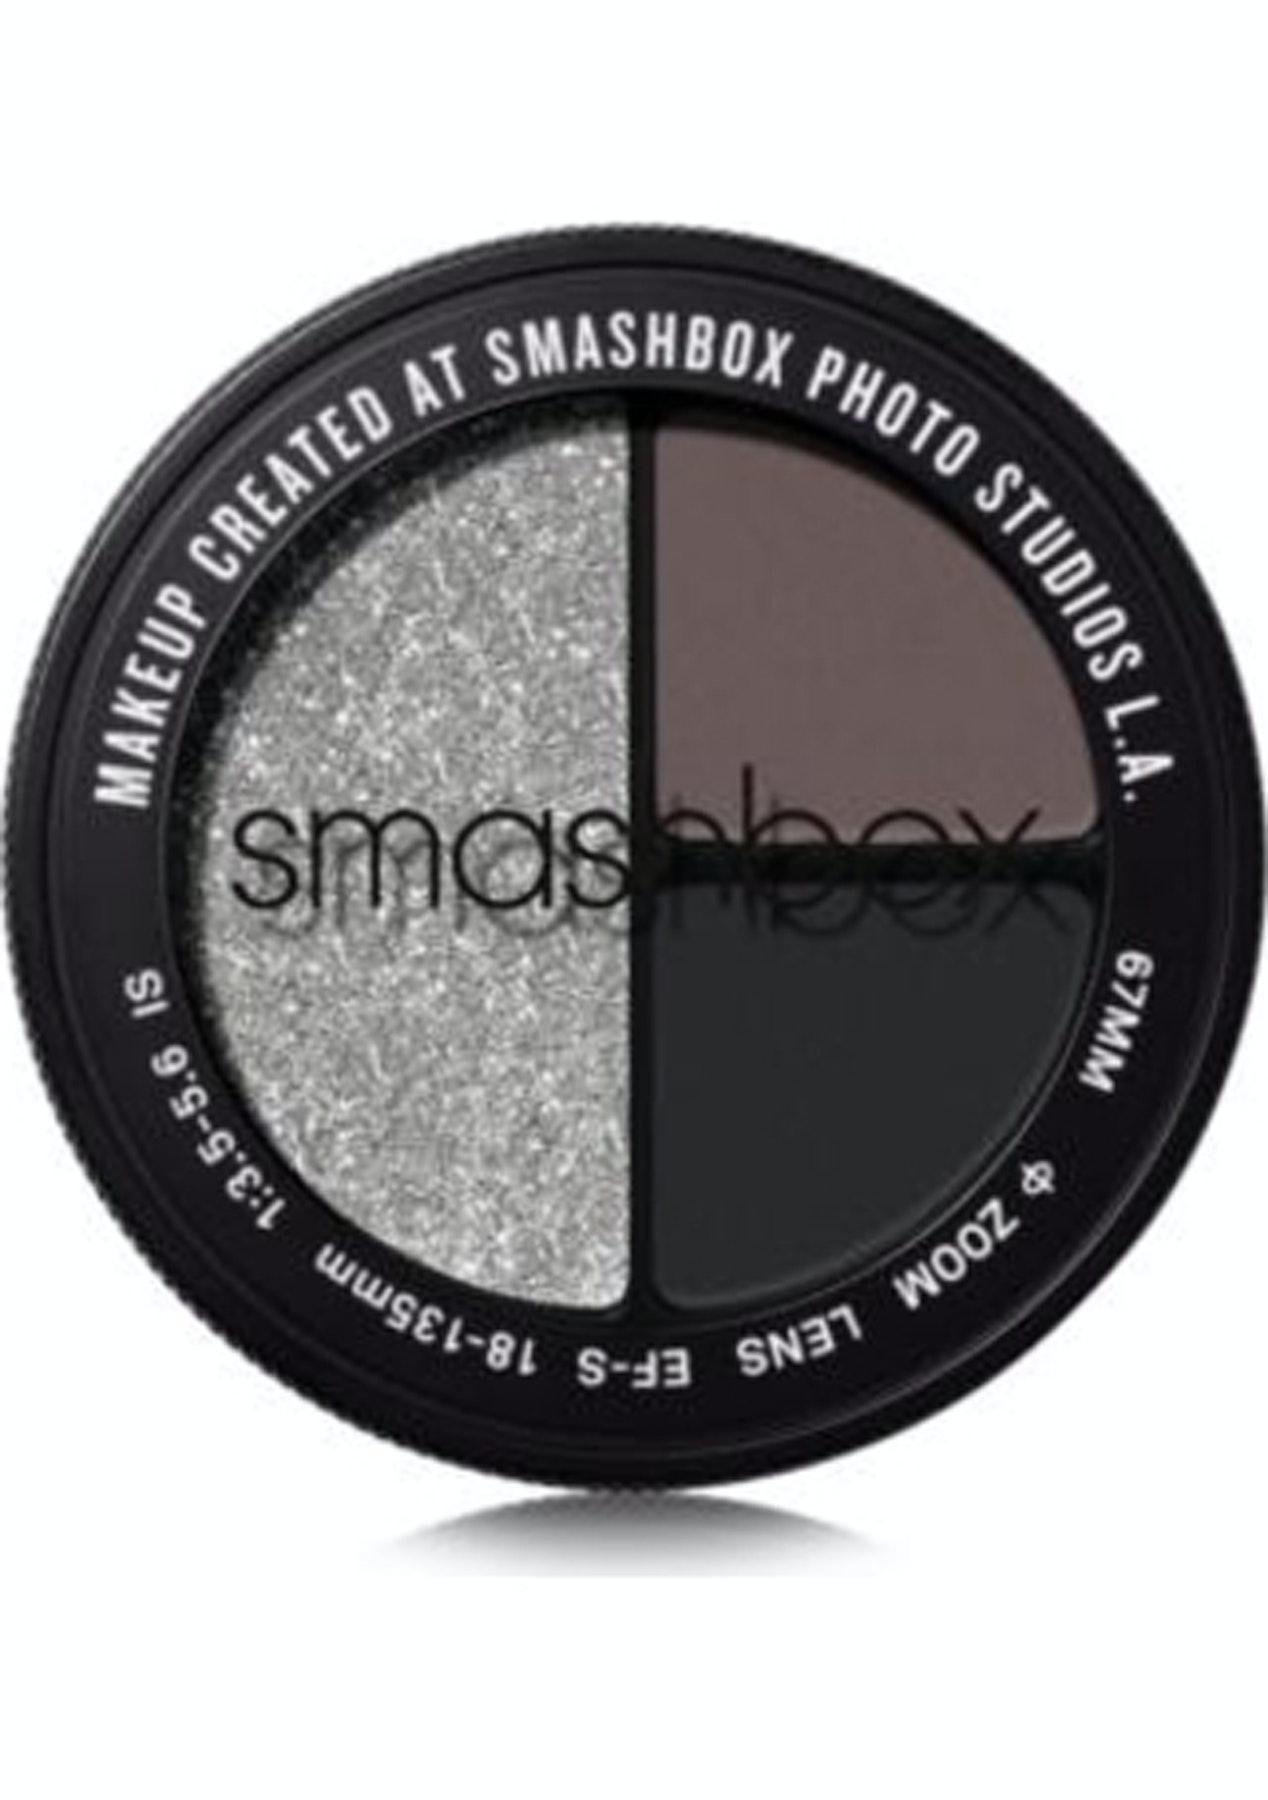 Smashbox Photo Edit Eye Shadow Trio Punked Smashbox Encore Onceit